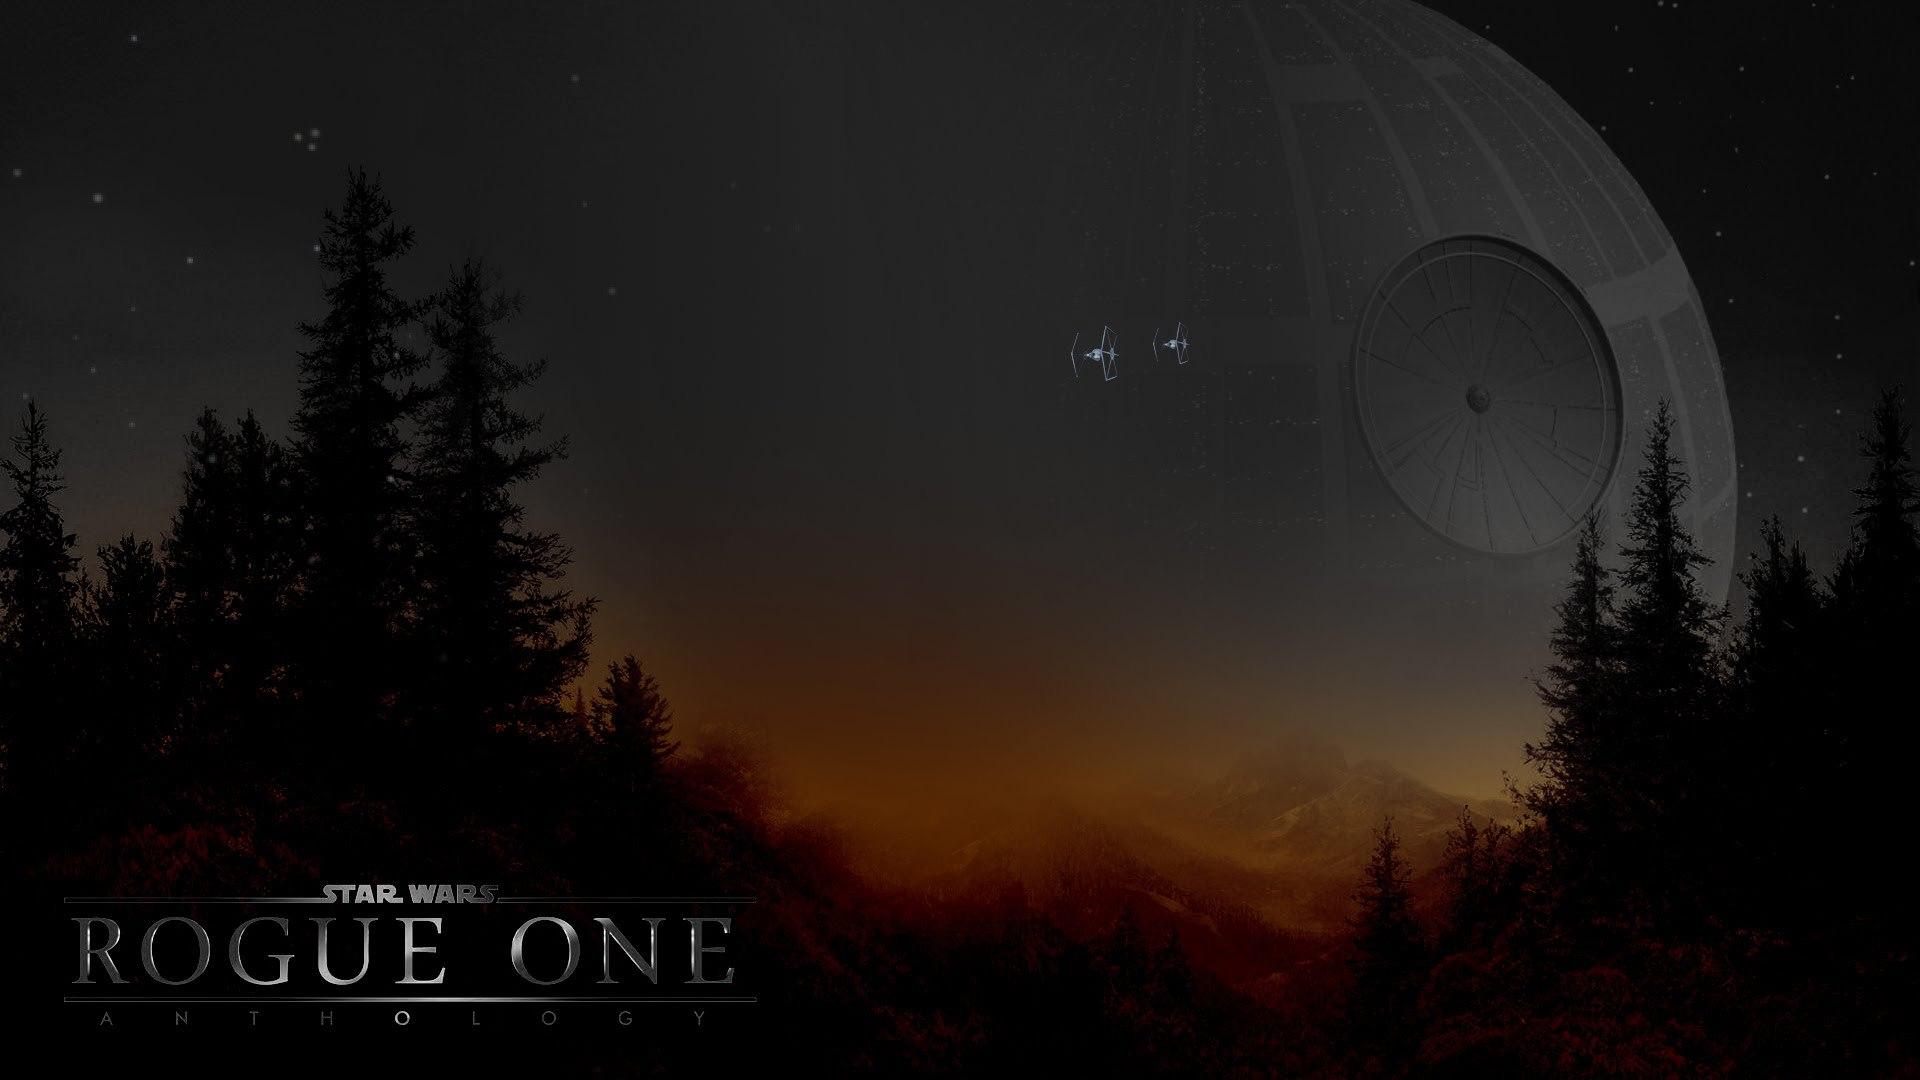 Star Wars Rogue One Photos